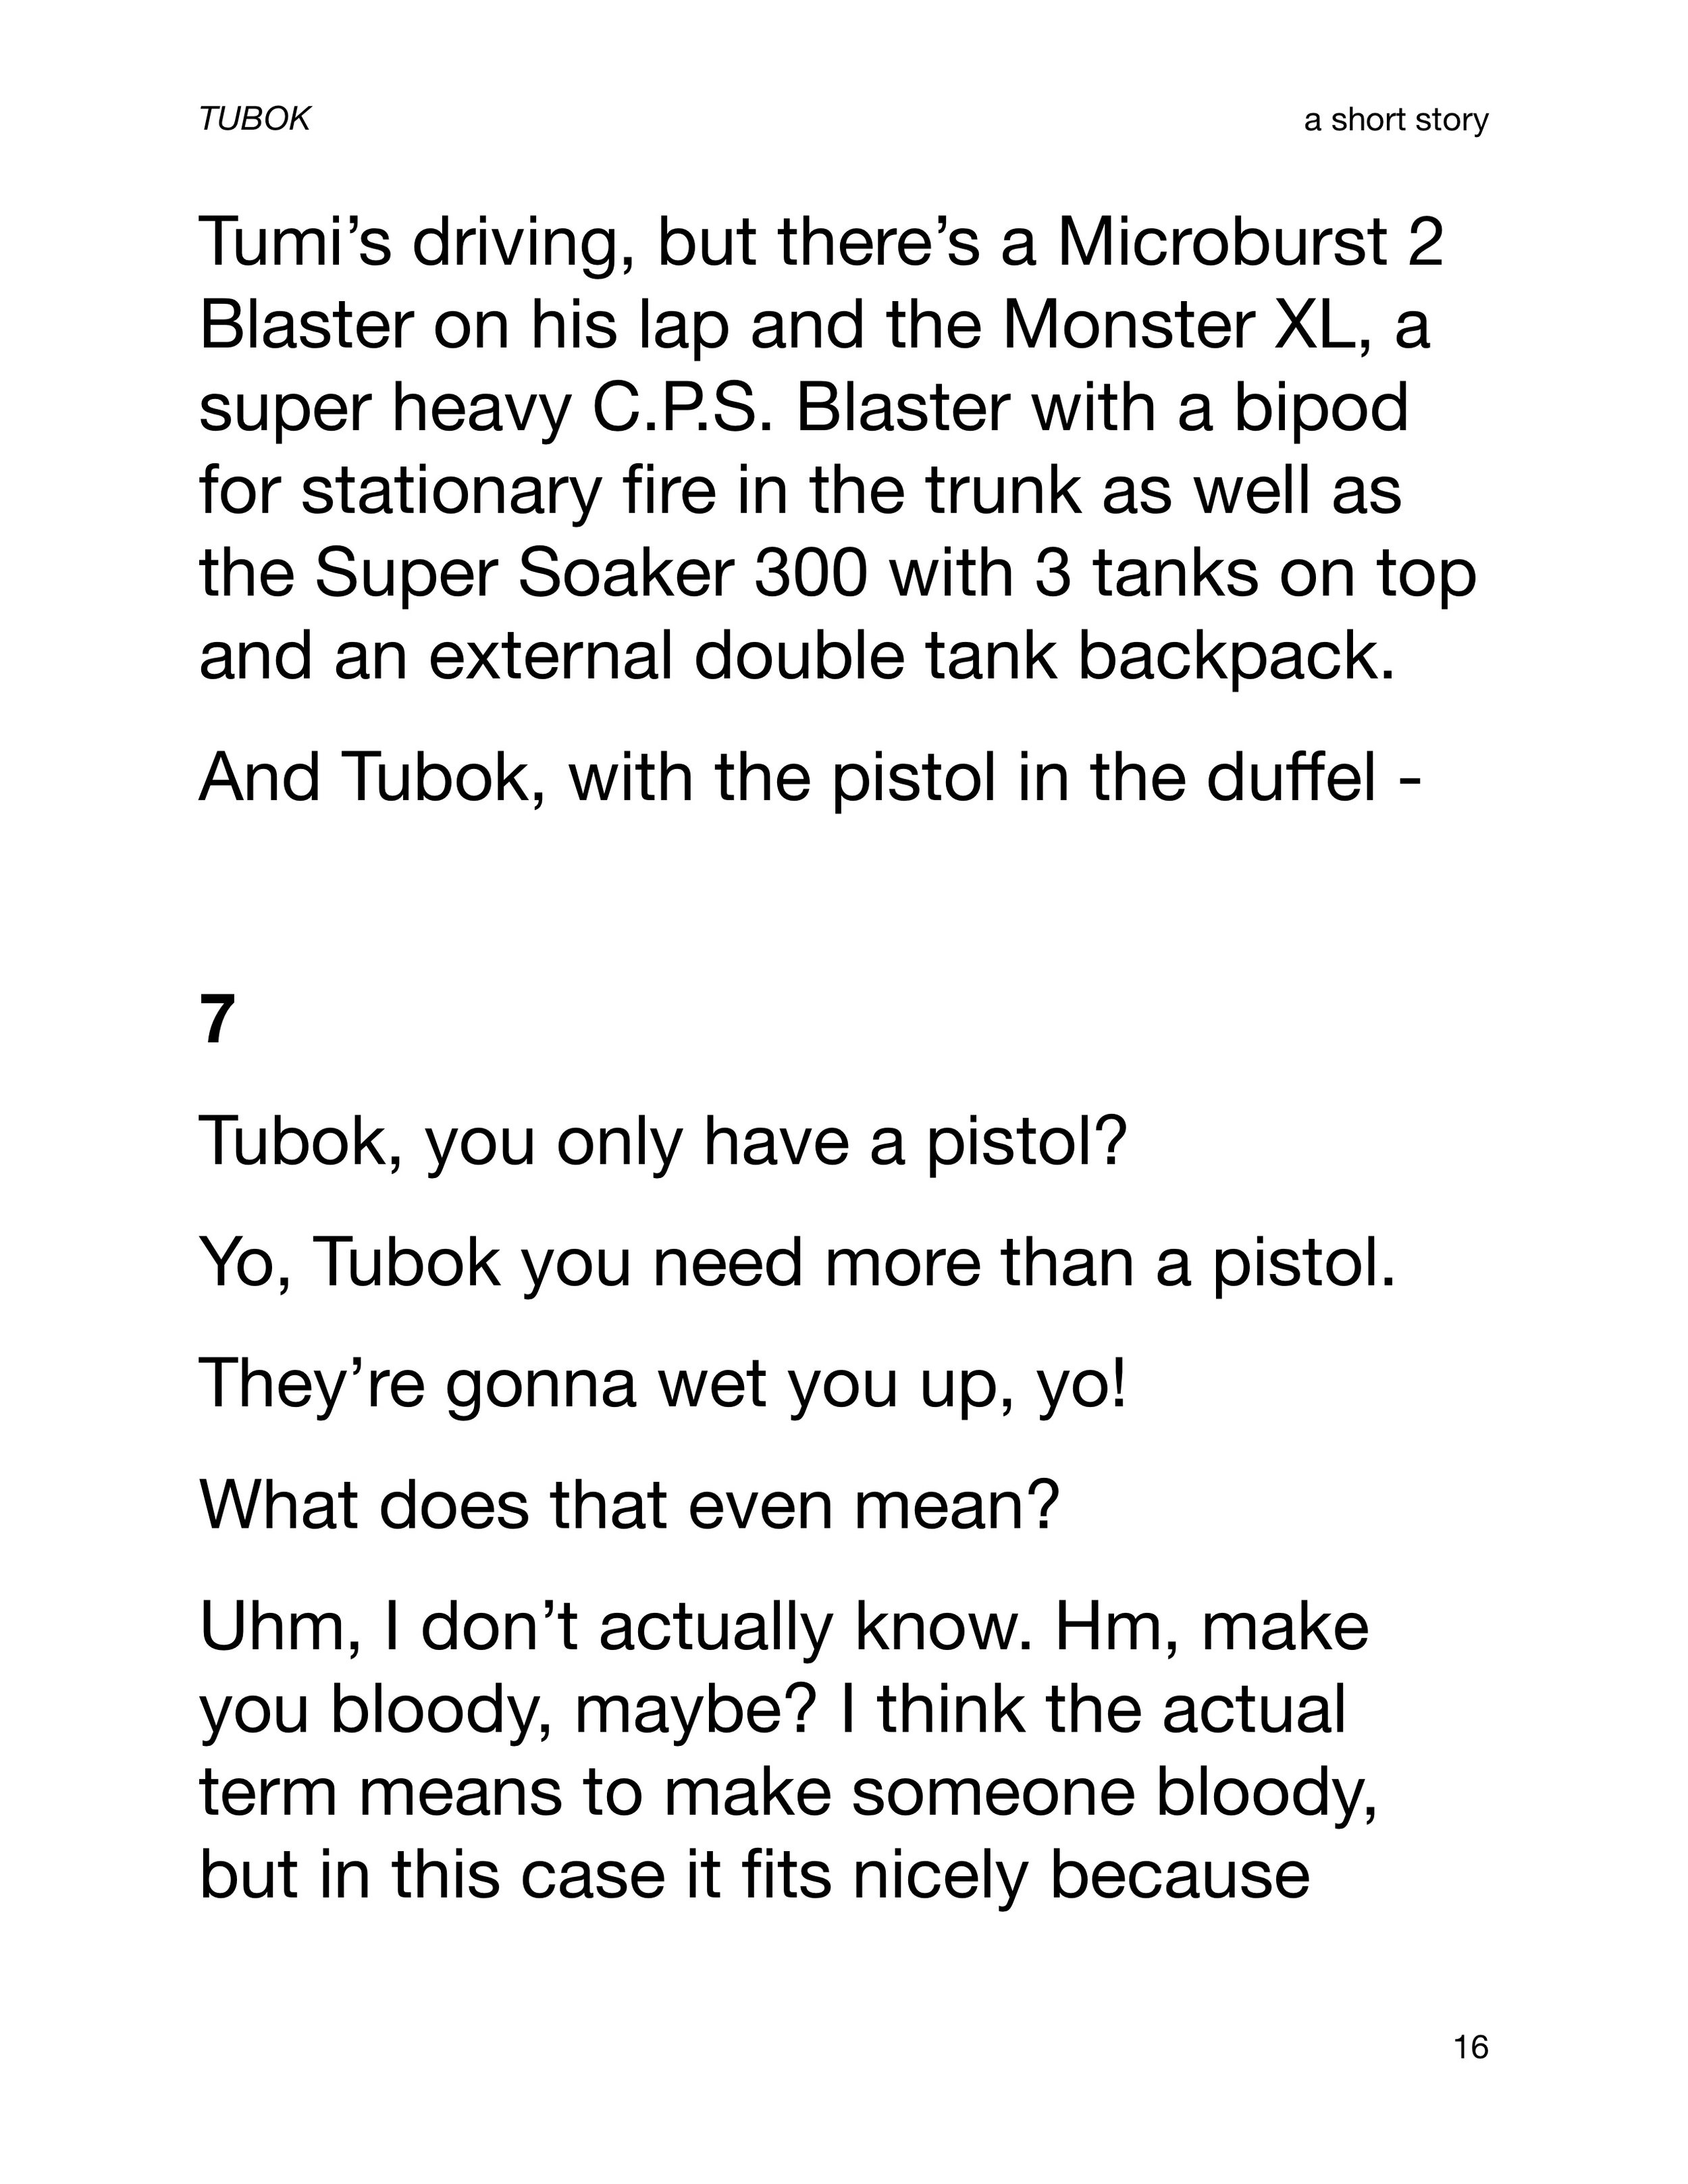 TUBOK (A Short Story) 16.jpg